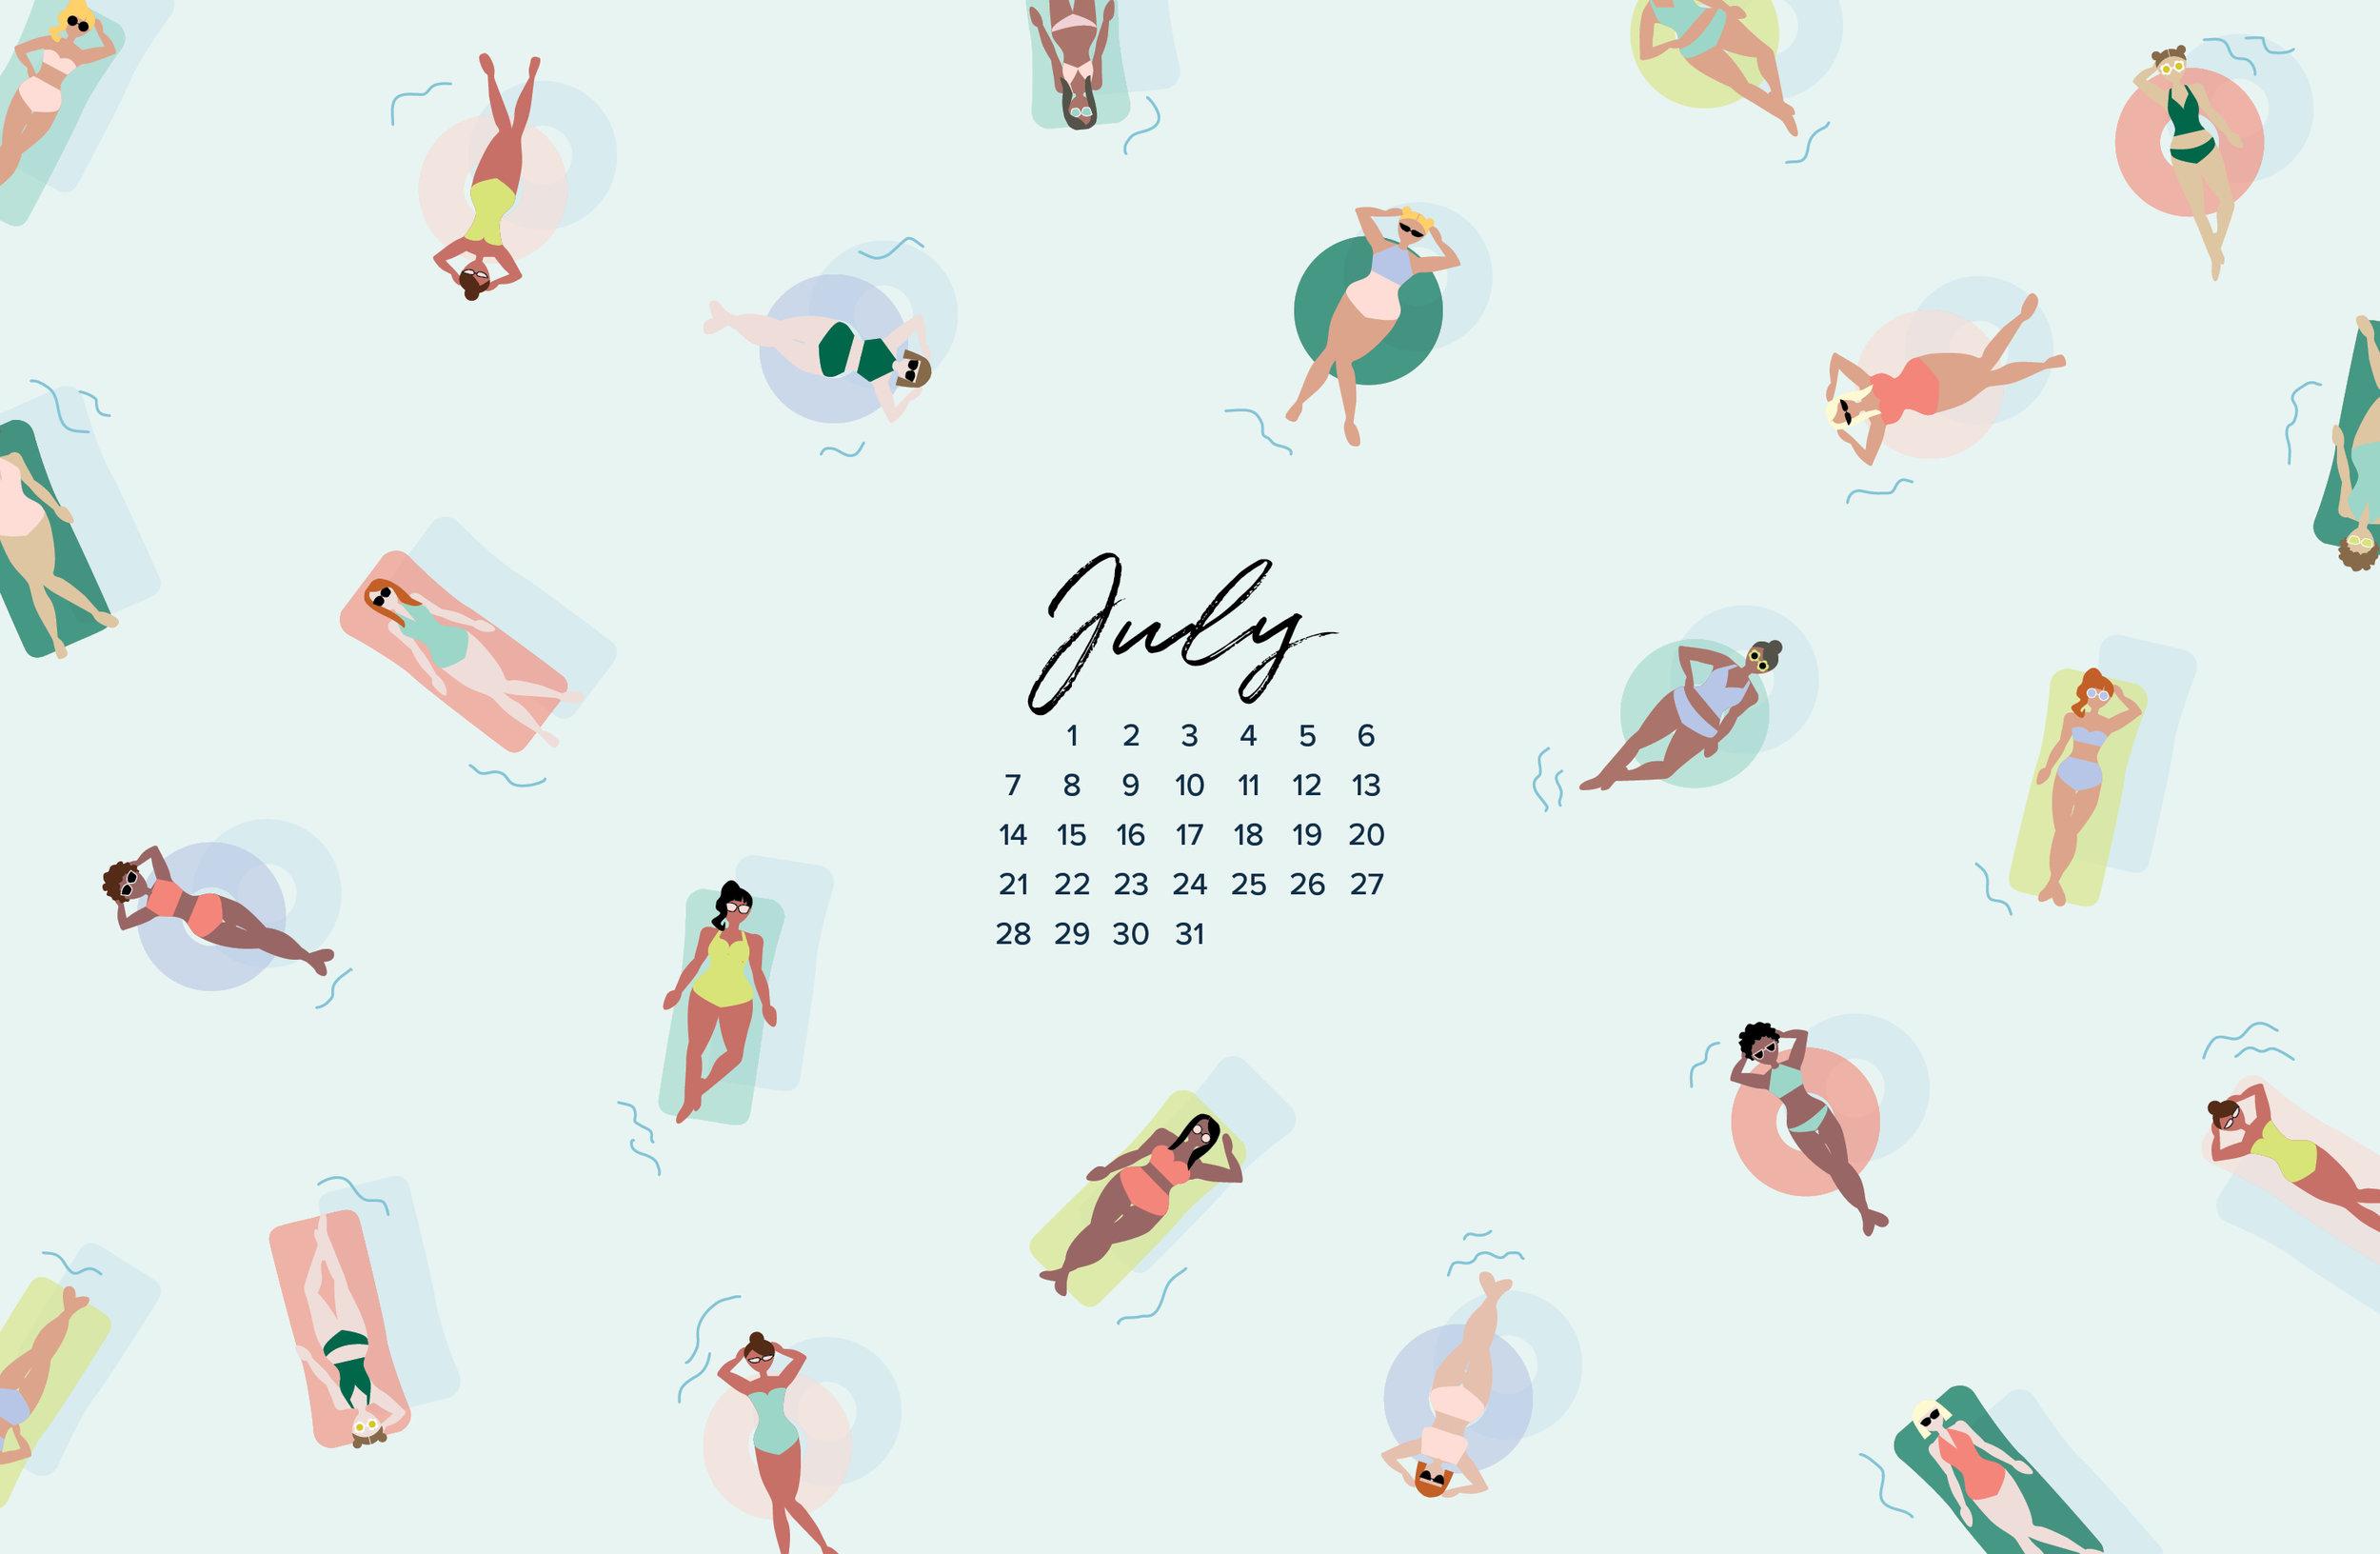 July_Summer_Freebies_3a.jpg